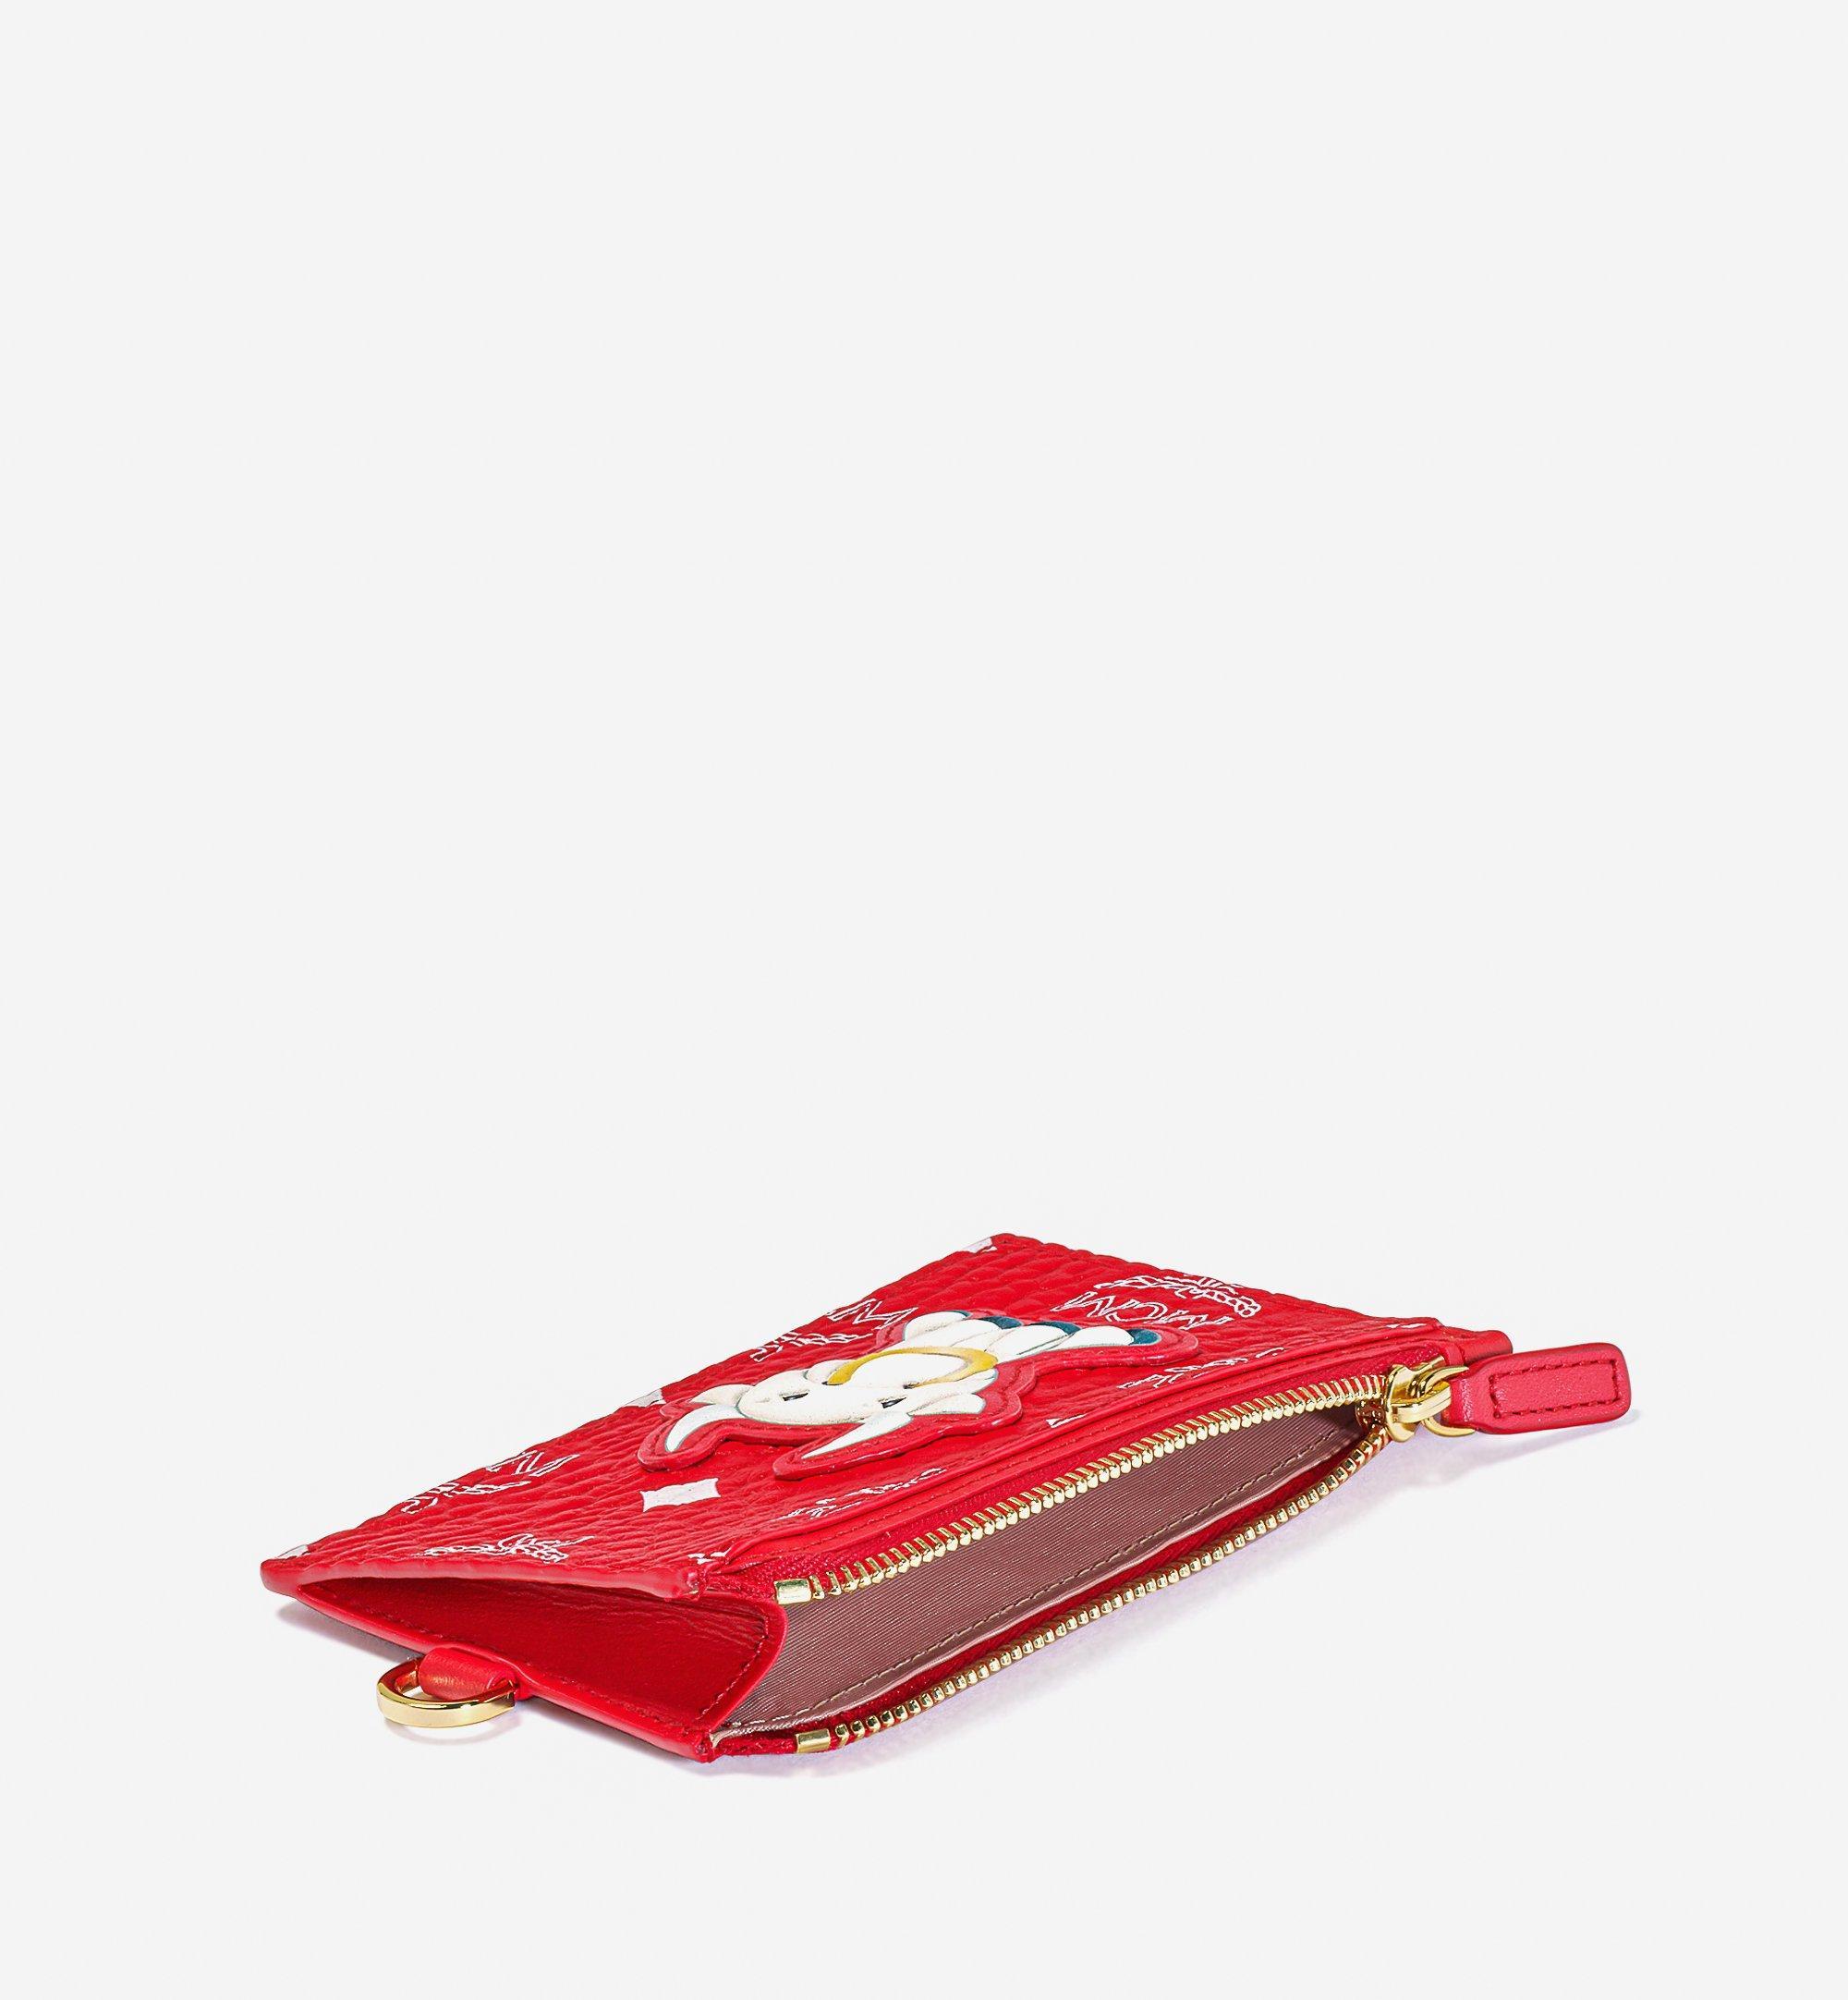 MCM Lanyard Card Holder in New Year Visetos Red MXZBSXL02AV001 Alternate View 1